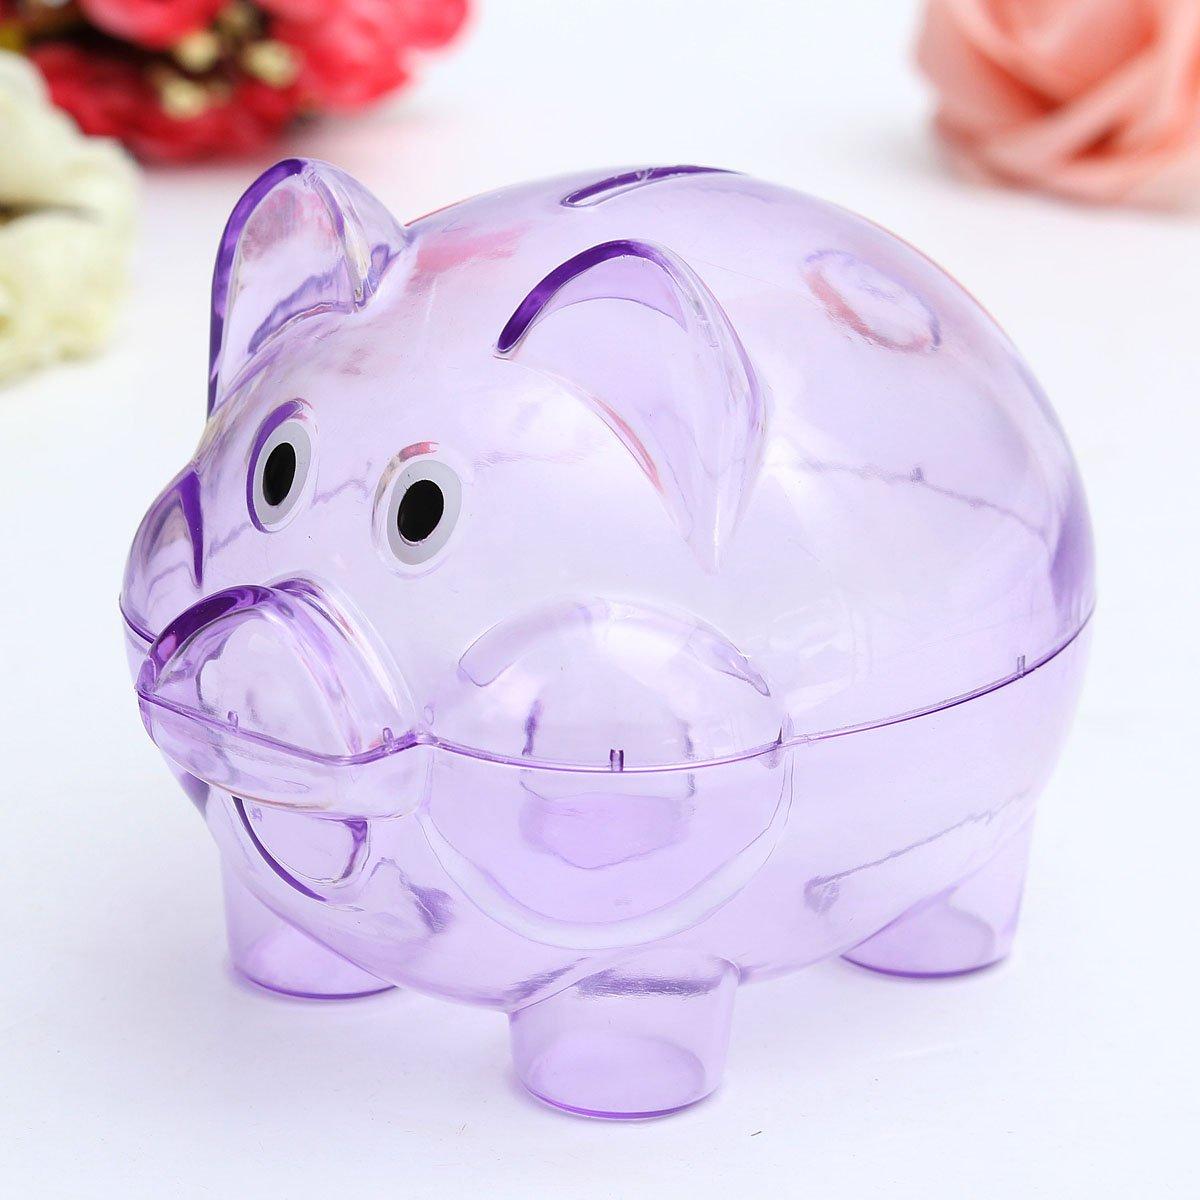 Children Kids Baby Portable Cute Plastic Pig Clear Piggy Bank Coins Box Storage Box Money Saving Case Toy Gift Buckdirect Worldwide Ltd.